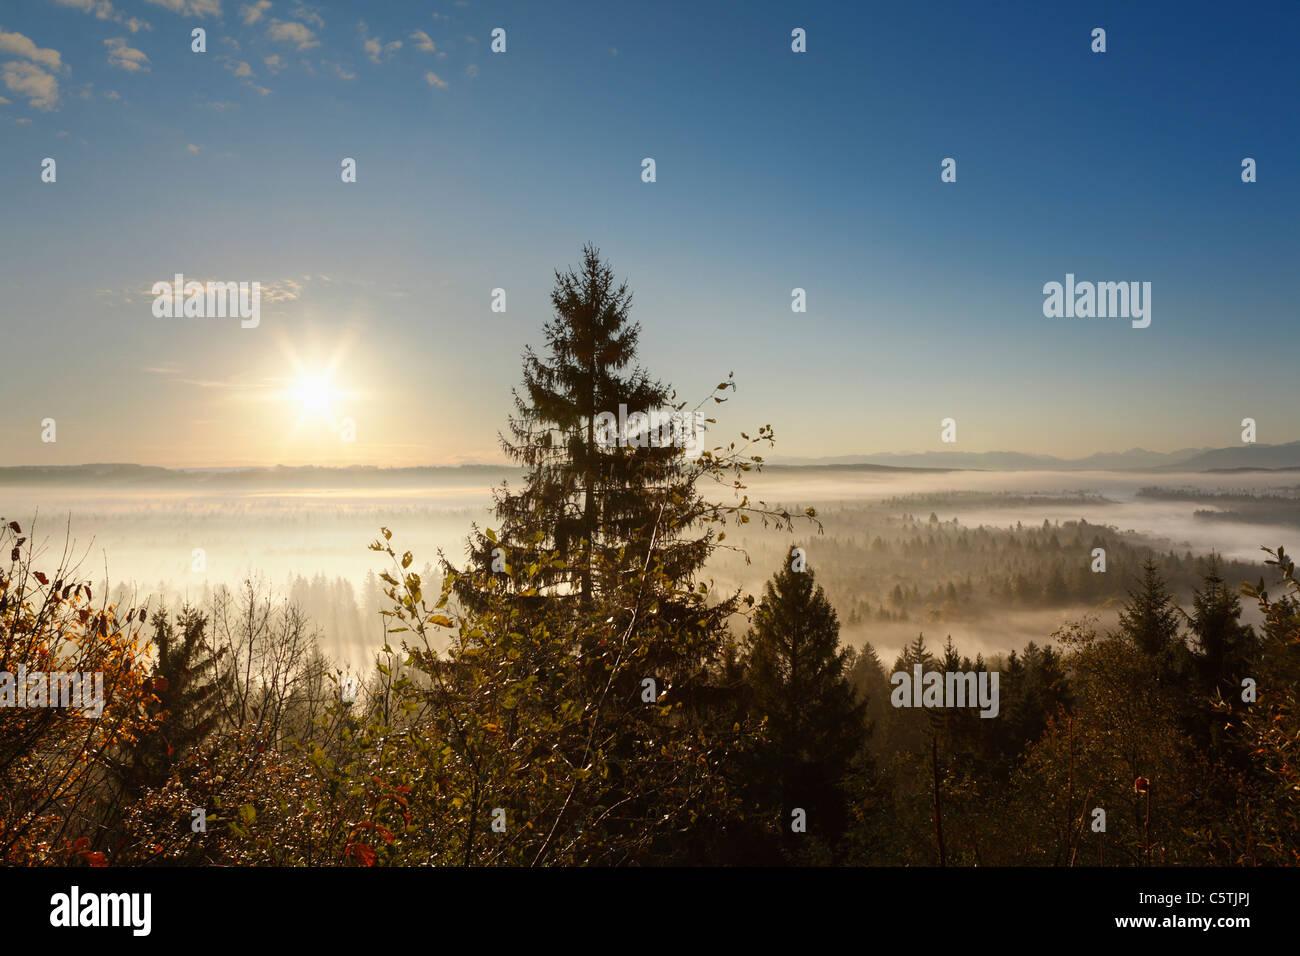 Germany, Bavaria, Upper Bavaria, View of pupplinger au near wolfratshausen - Stock Image